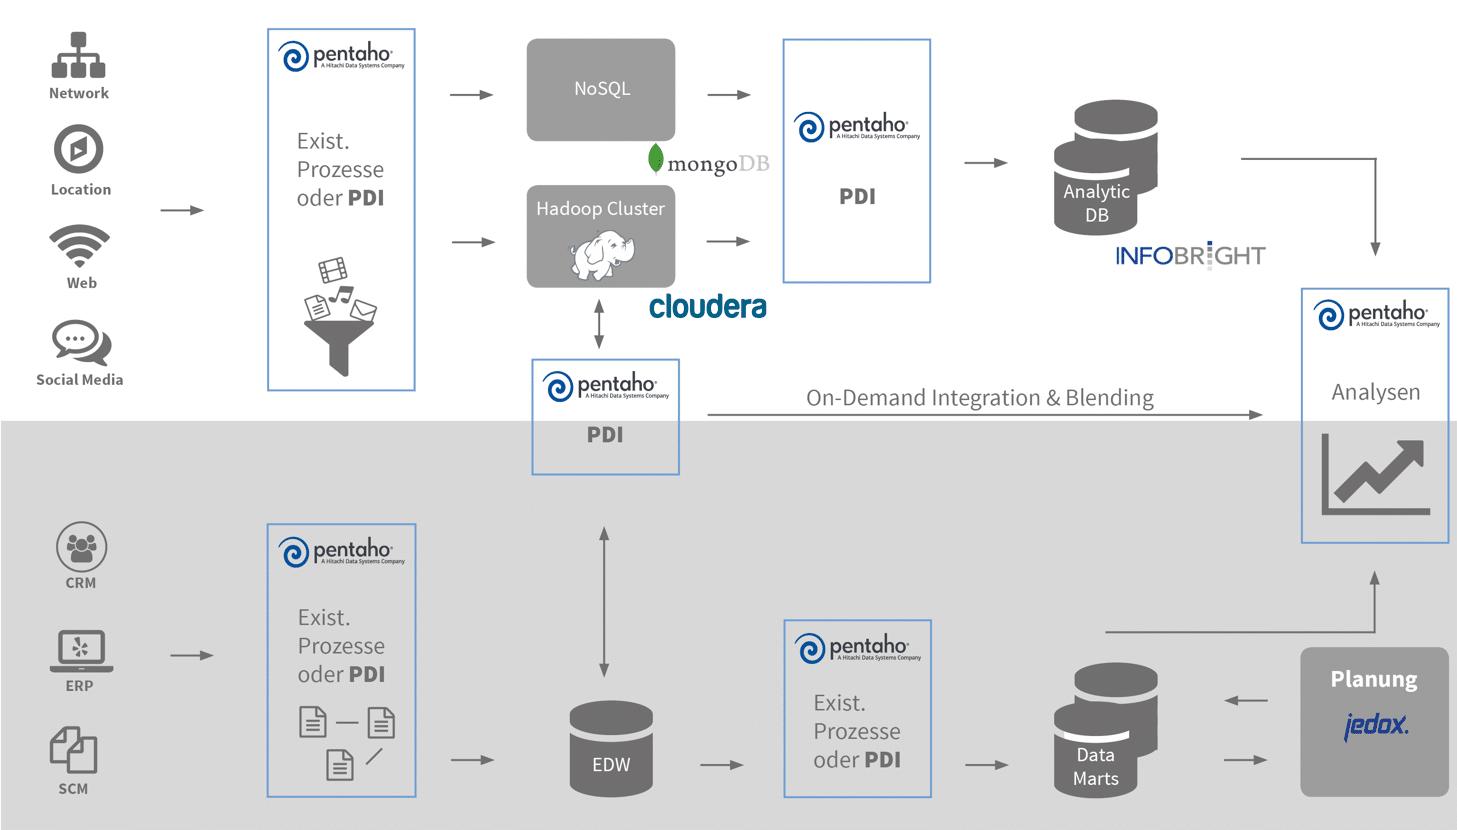 Integrating SAP data in data warehouse and data lake